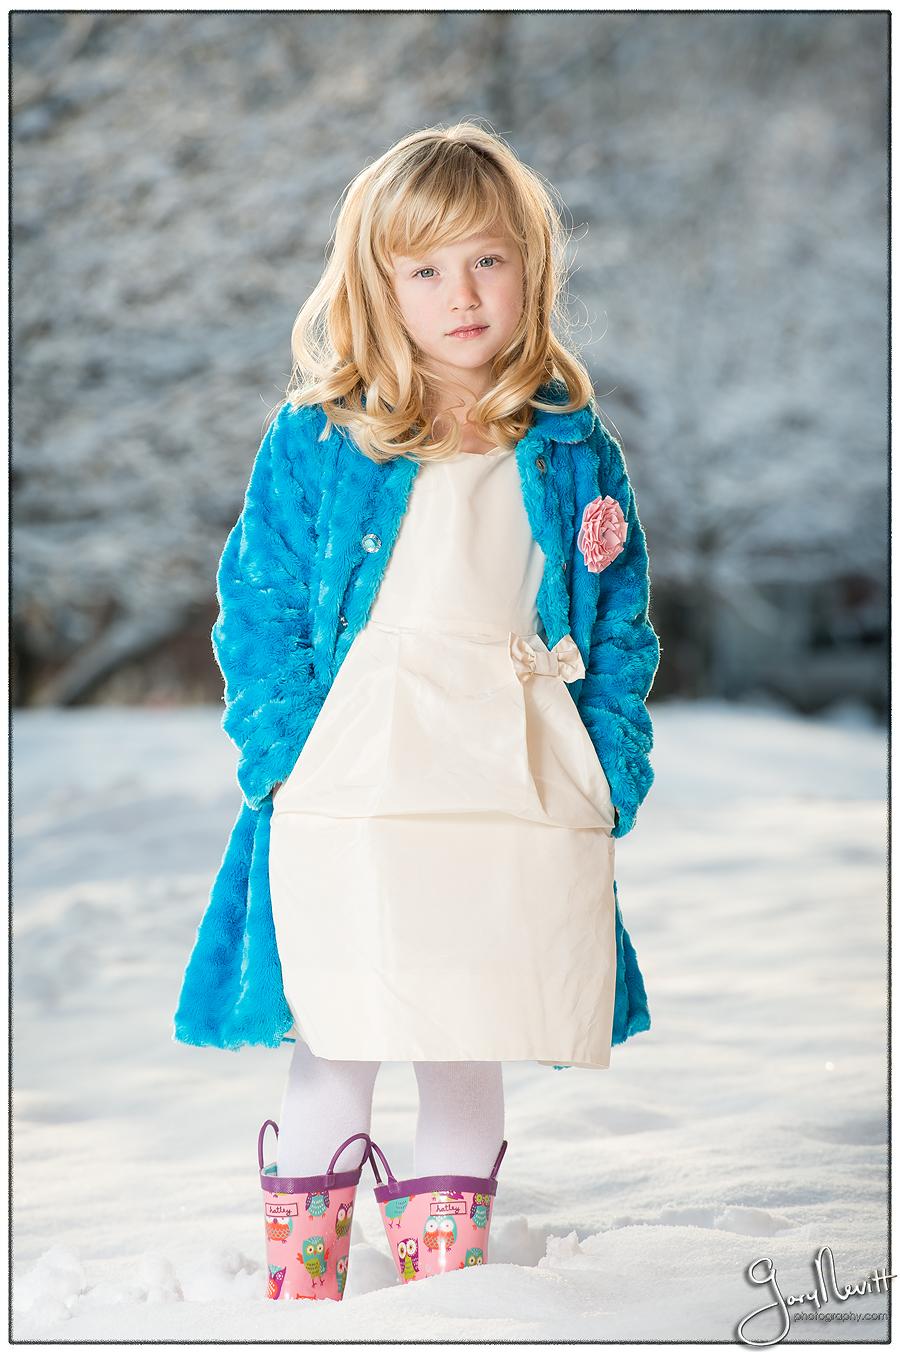 6 year old girl photography - Snow portrait - Philadelphia- Gary Nevitt Photography-180